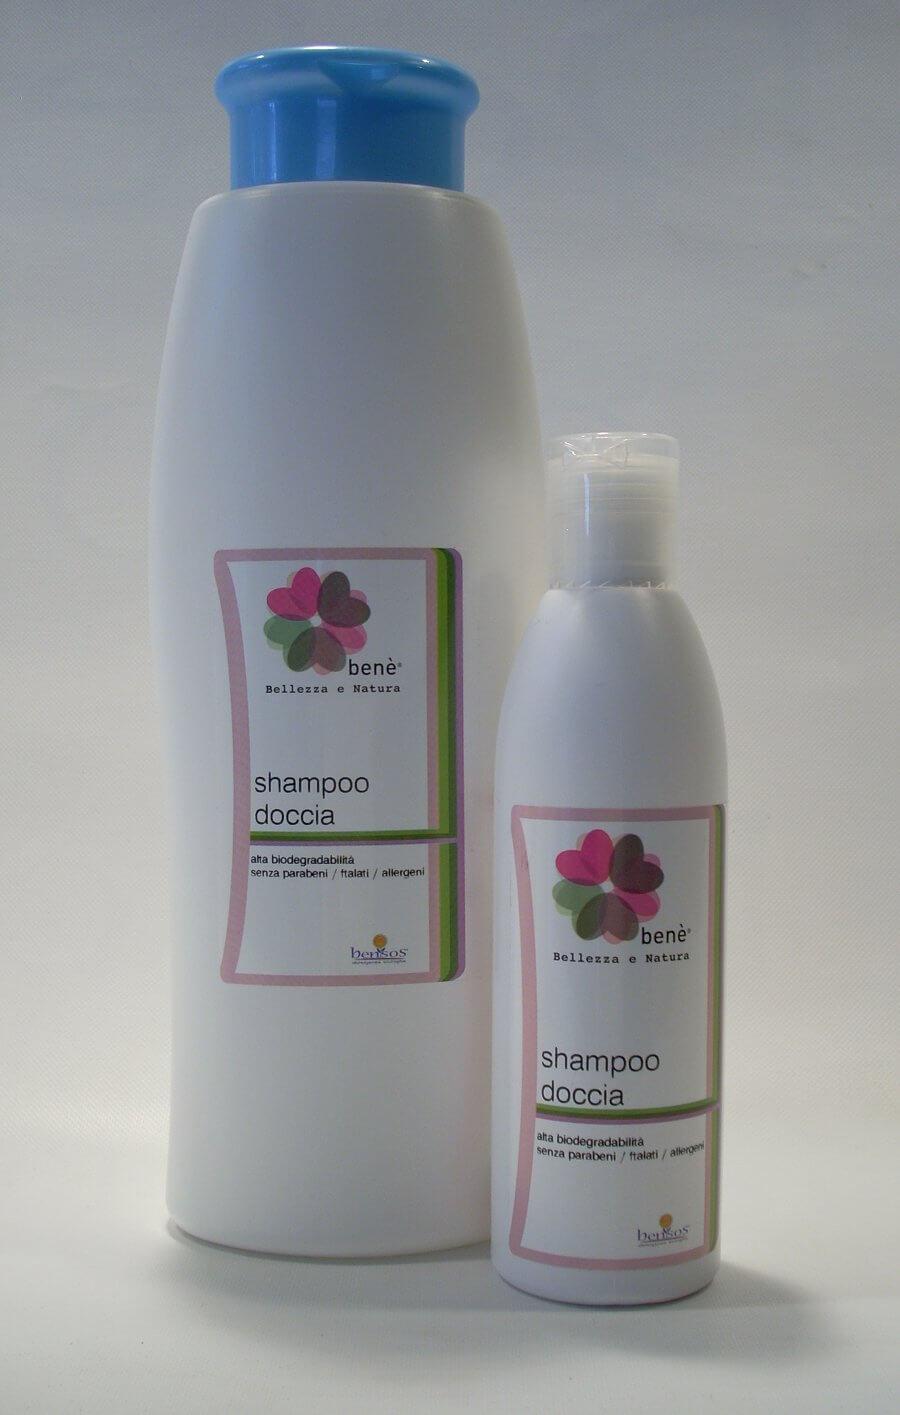 Benè Shampoo Doccia, naturale ed emolliente